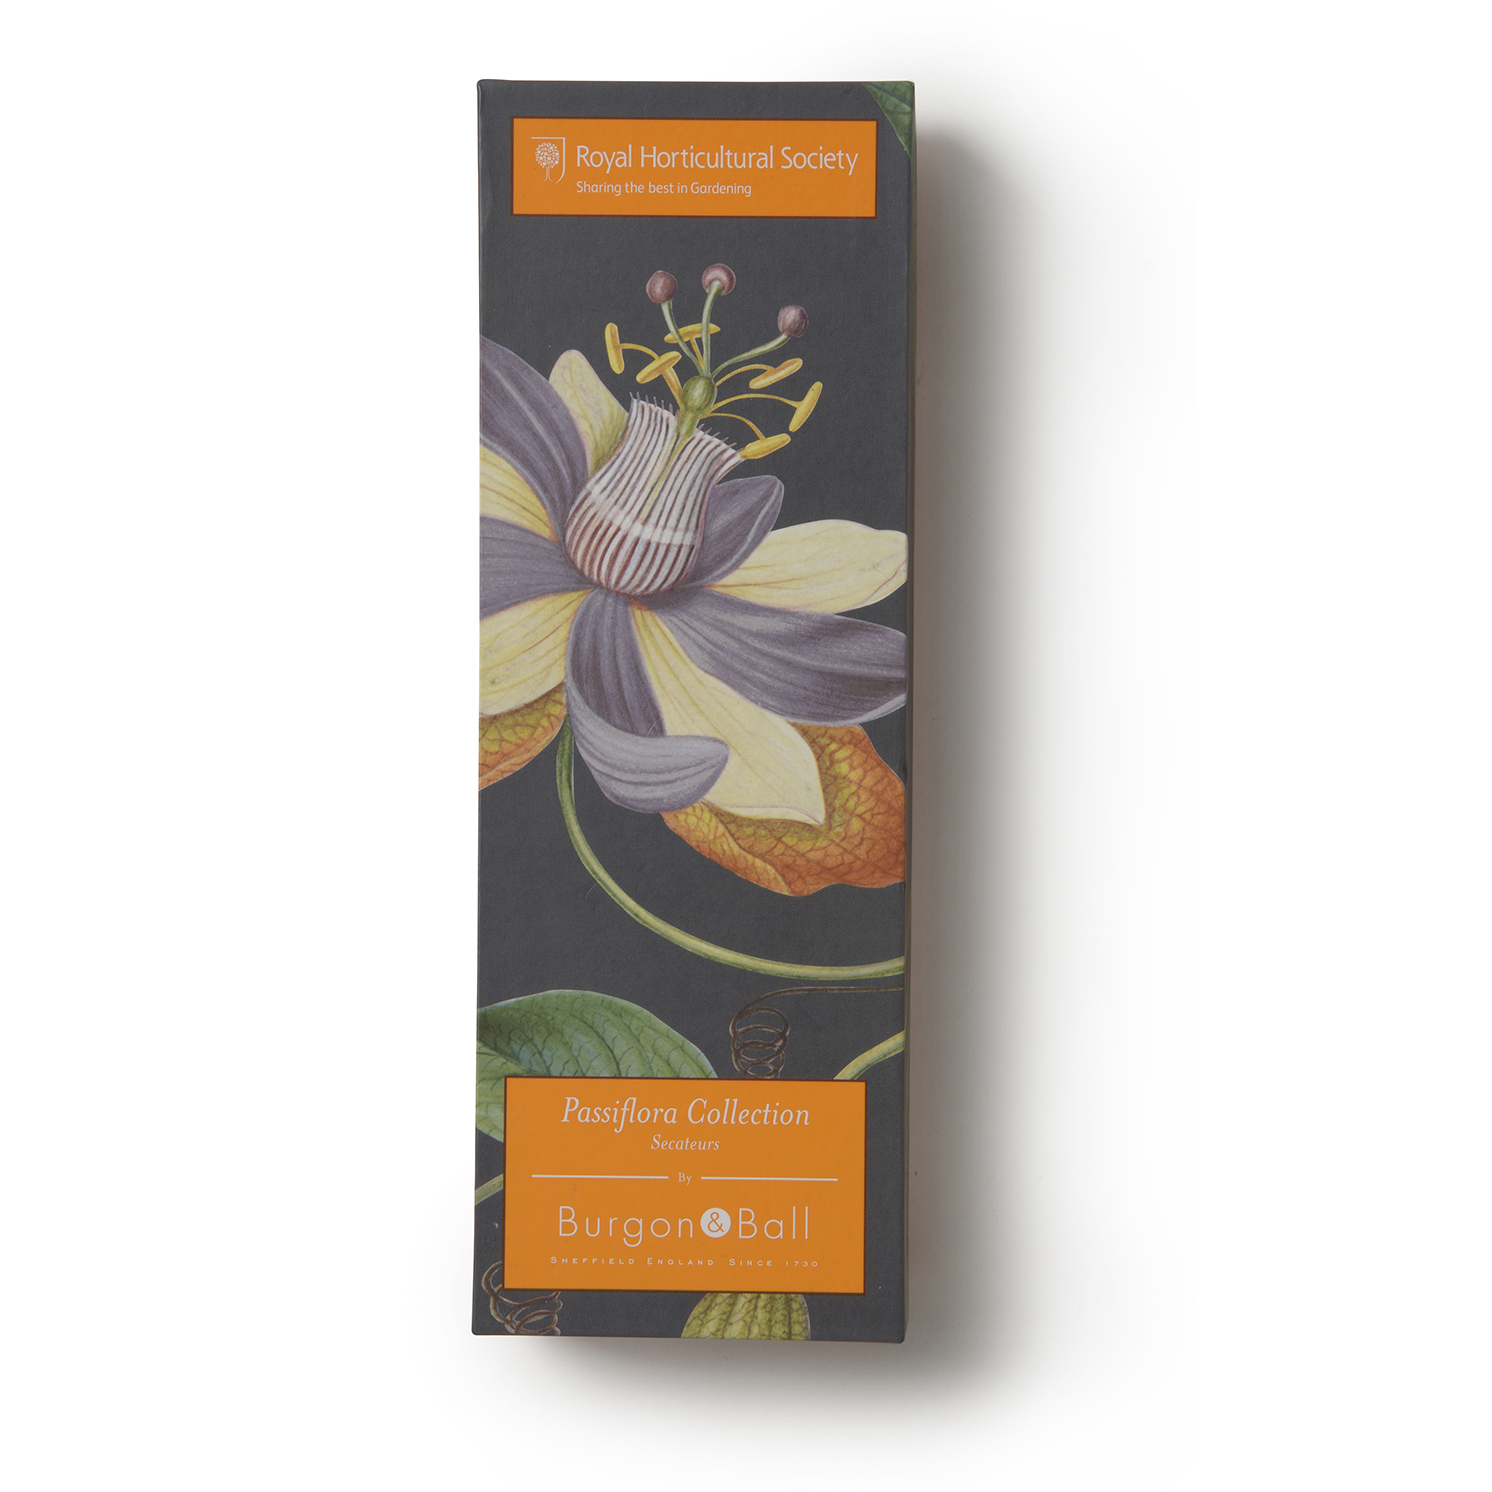 Burgon & Ball – RHS Passiflora Secateurs in Presentation Gift Box